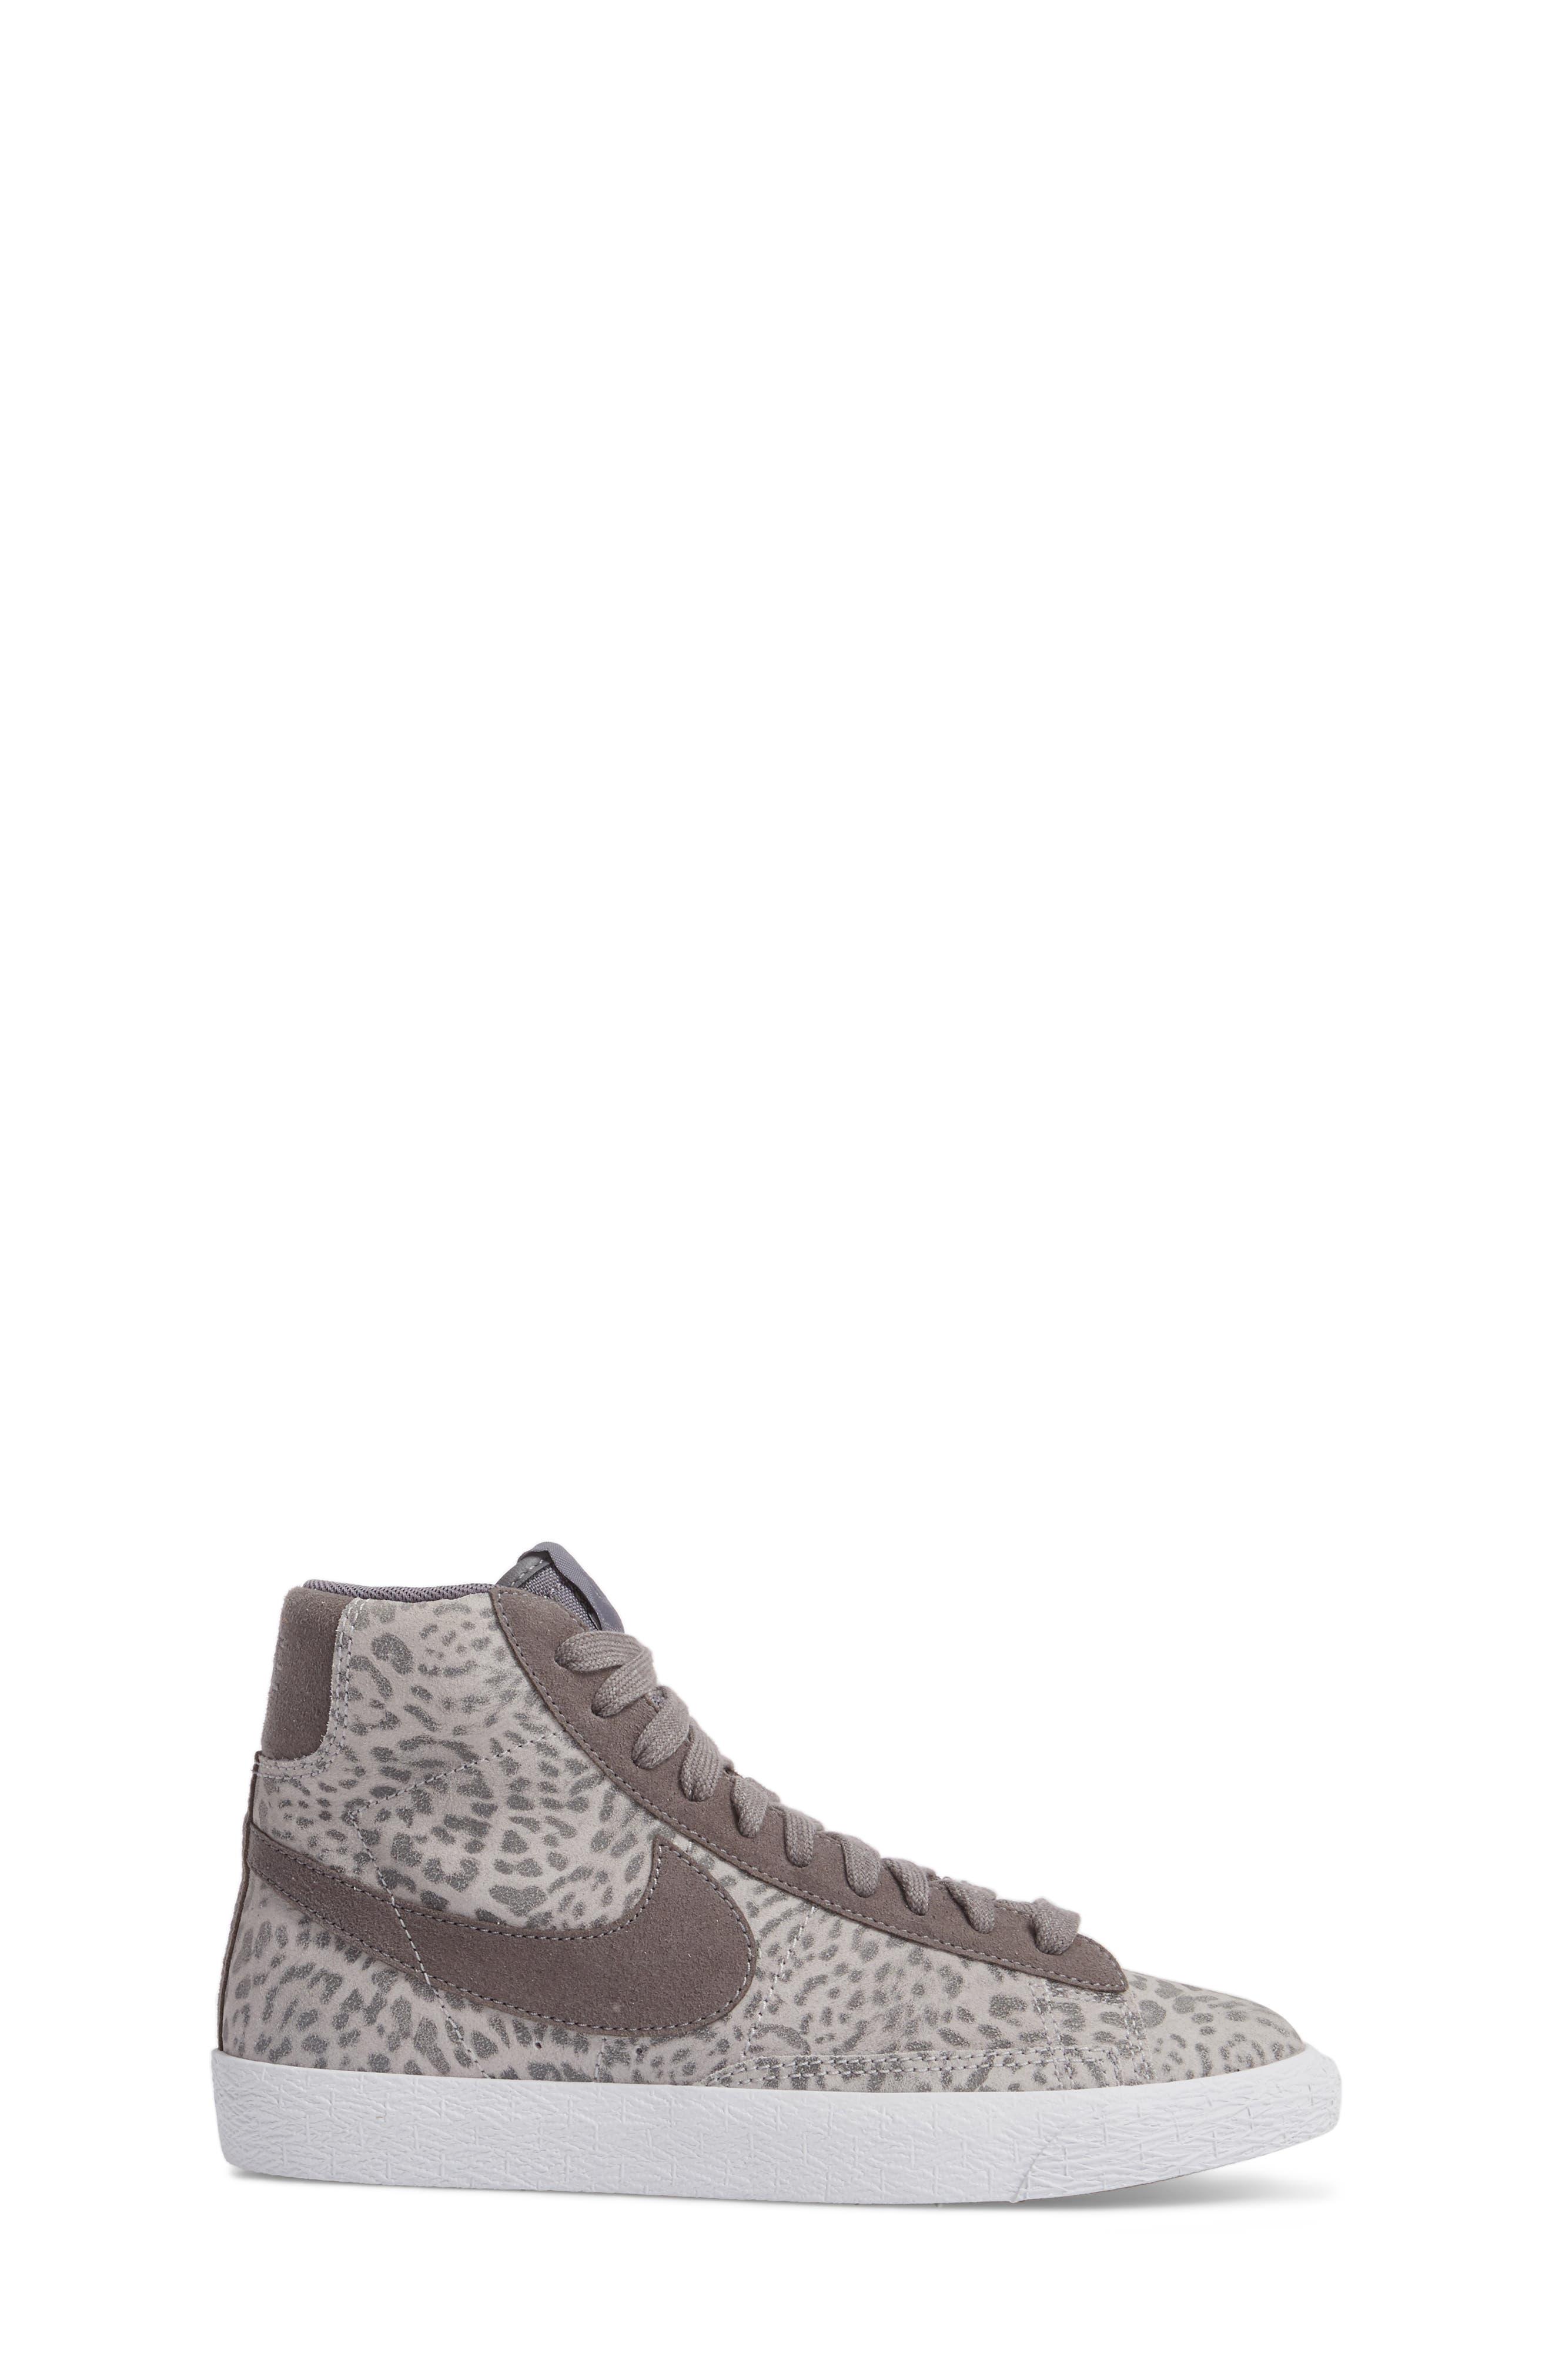 Blazer Mid SE High Top Sneaker,                             Alternate thumbnail 3, color,                             Atmosphere Grey/ Smoke/ Gum